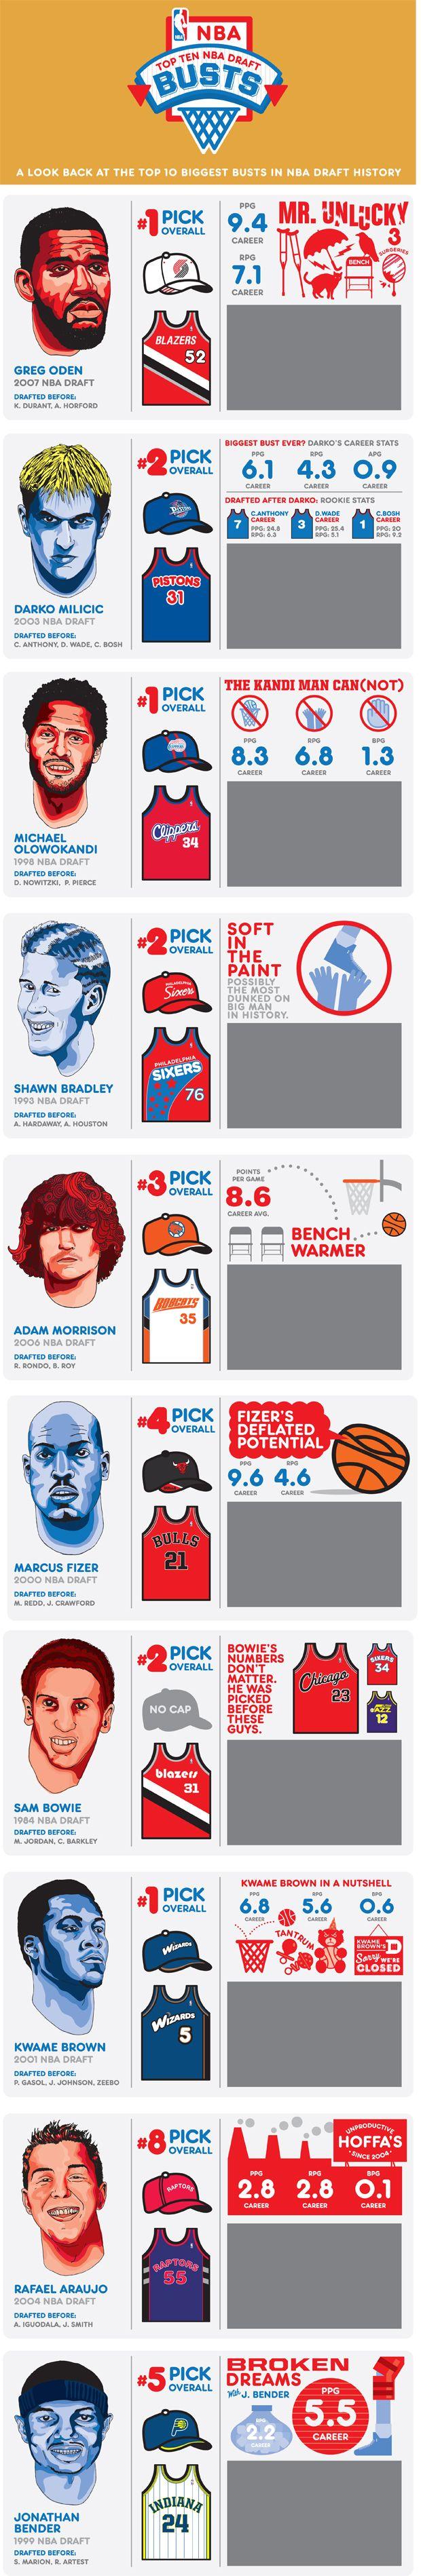 Biggest Busts #NBA